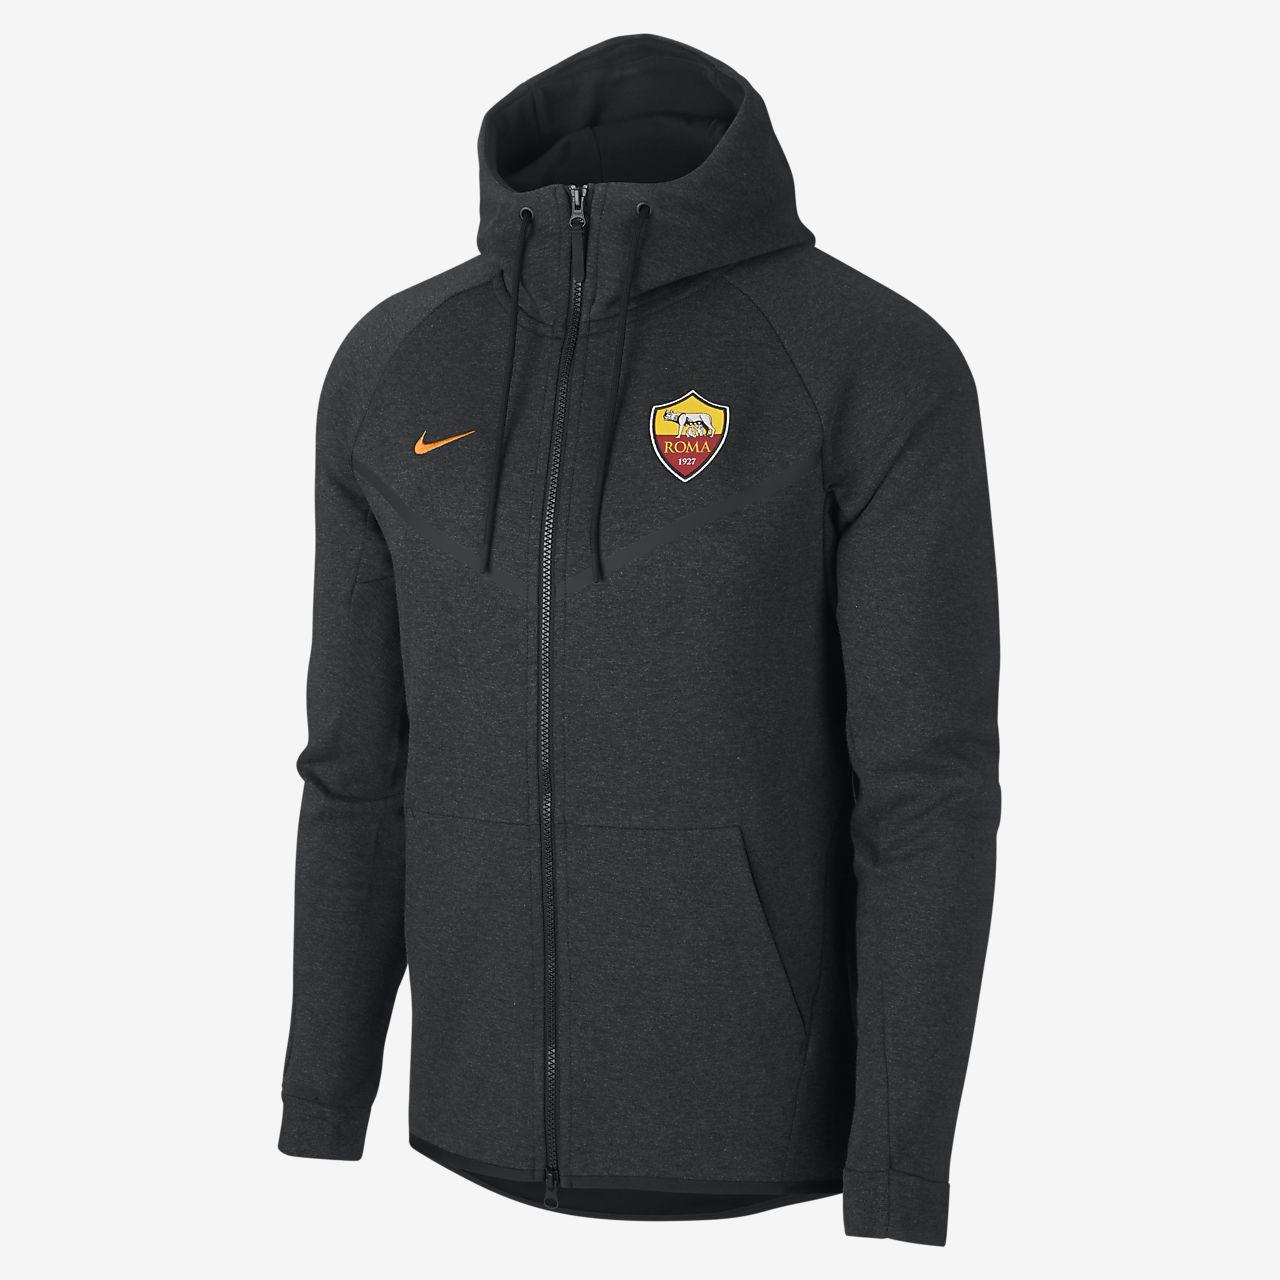 A.S. Roma Tech Fleece Windrunner Men's Jacket